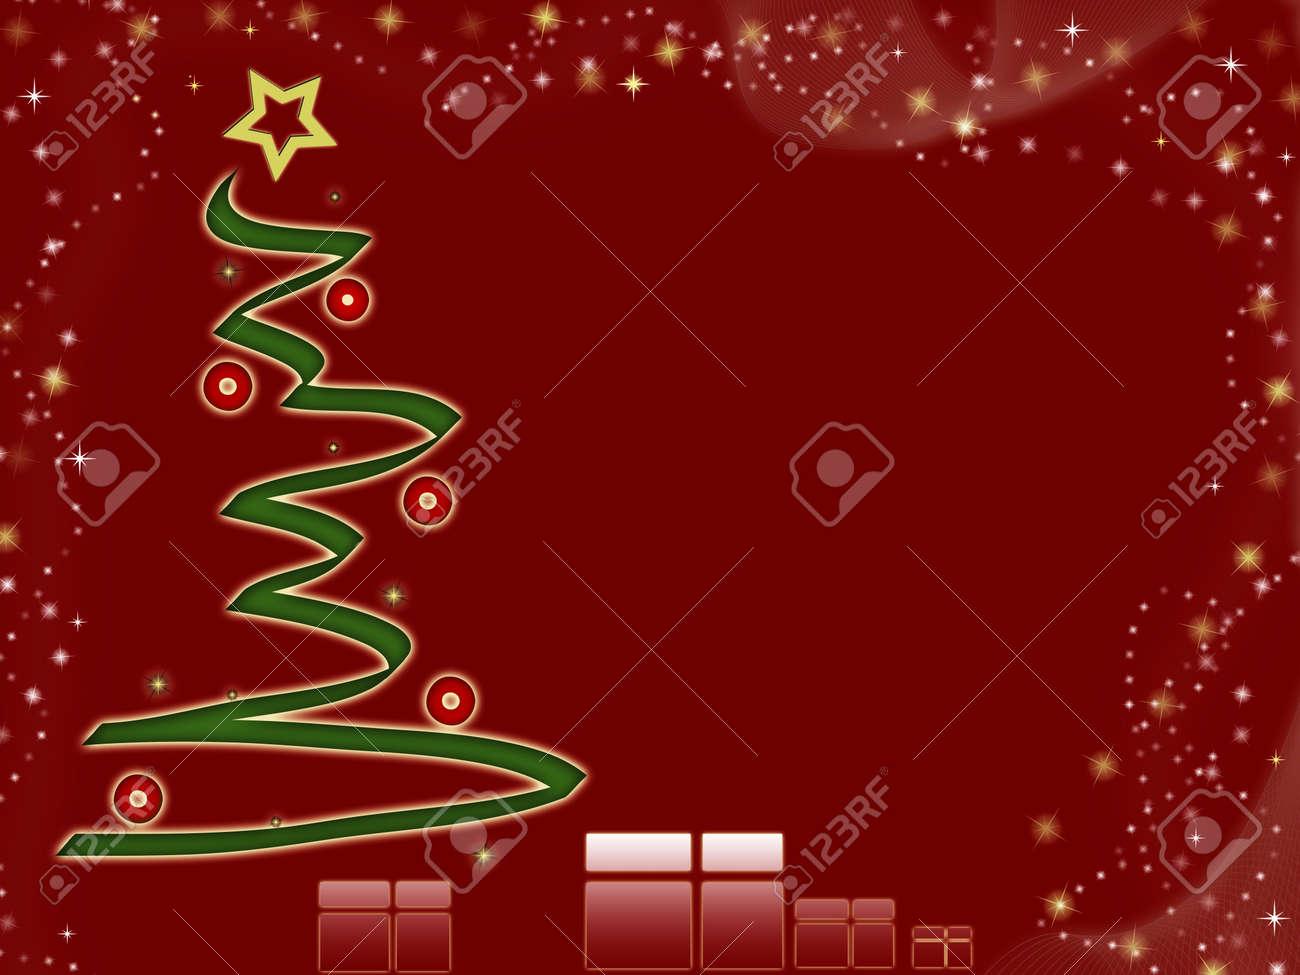 Computer Designed High Resolution Christmas Background